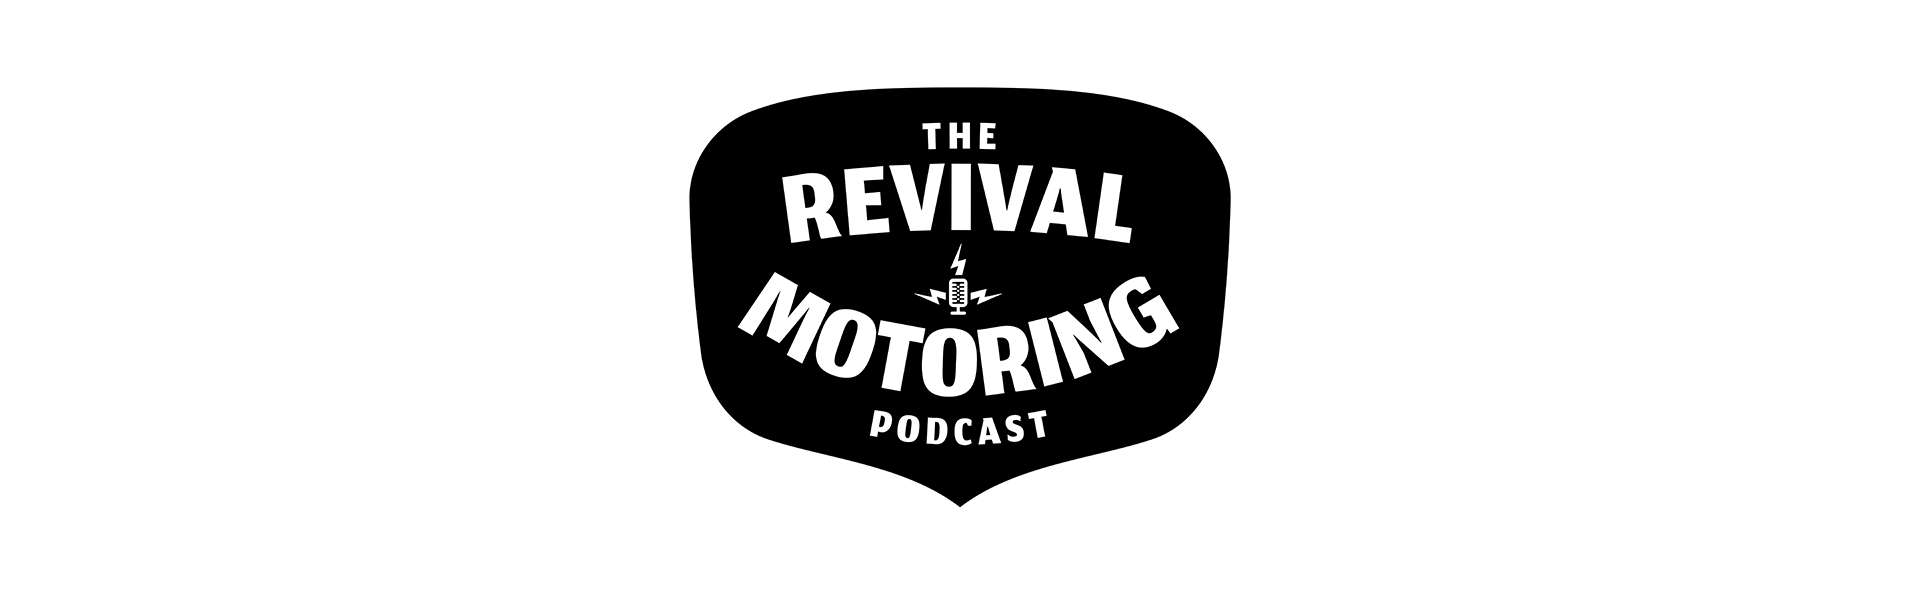 01_Revival Motoring Podcast copy